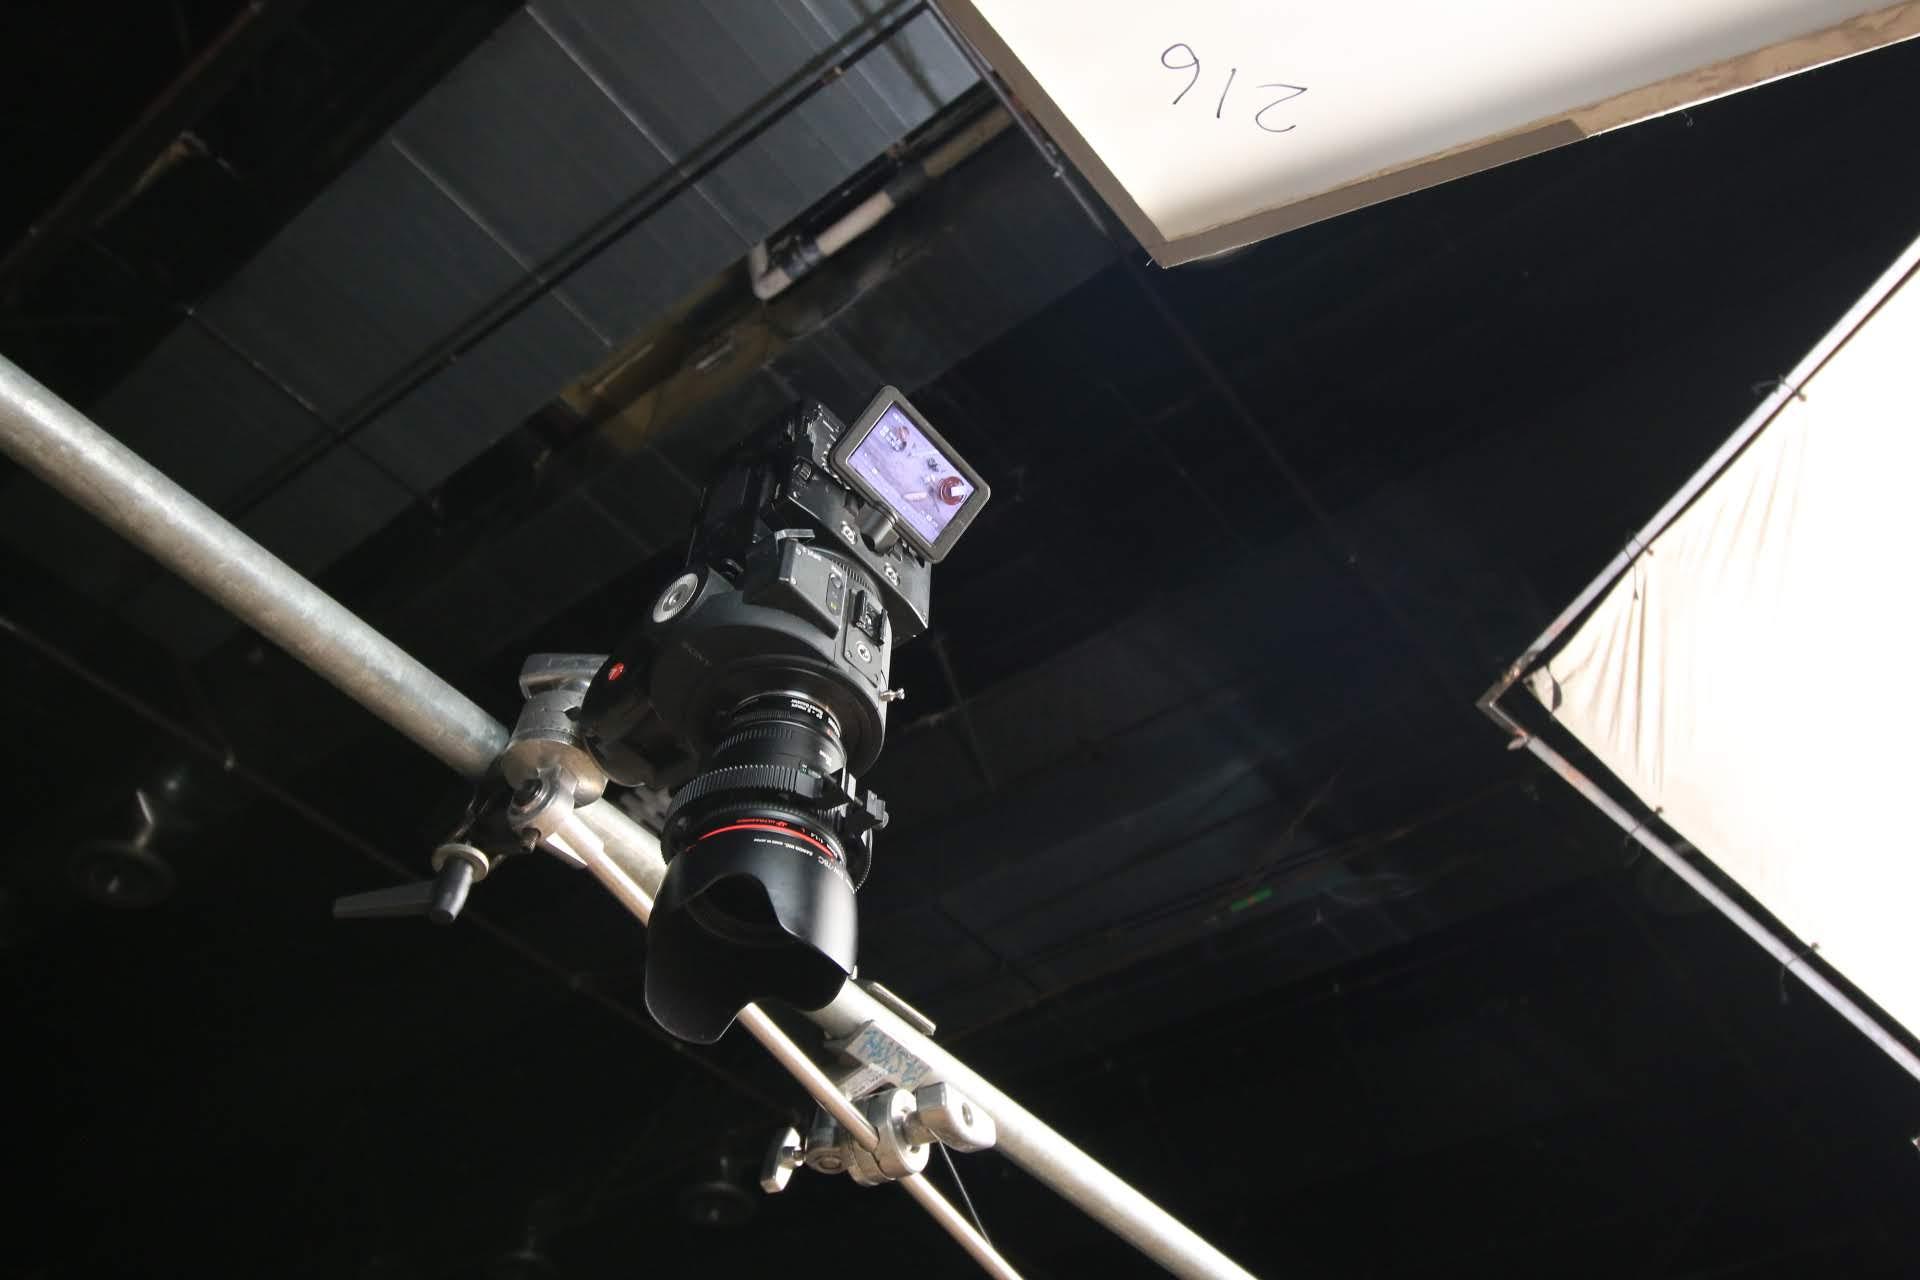 Sony FS700 Overhead Rig